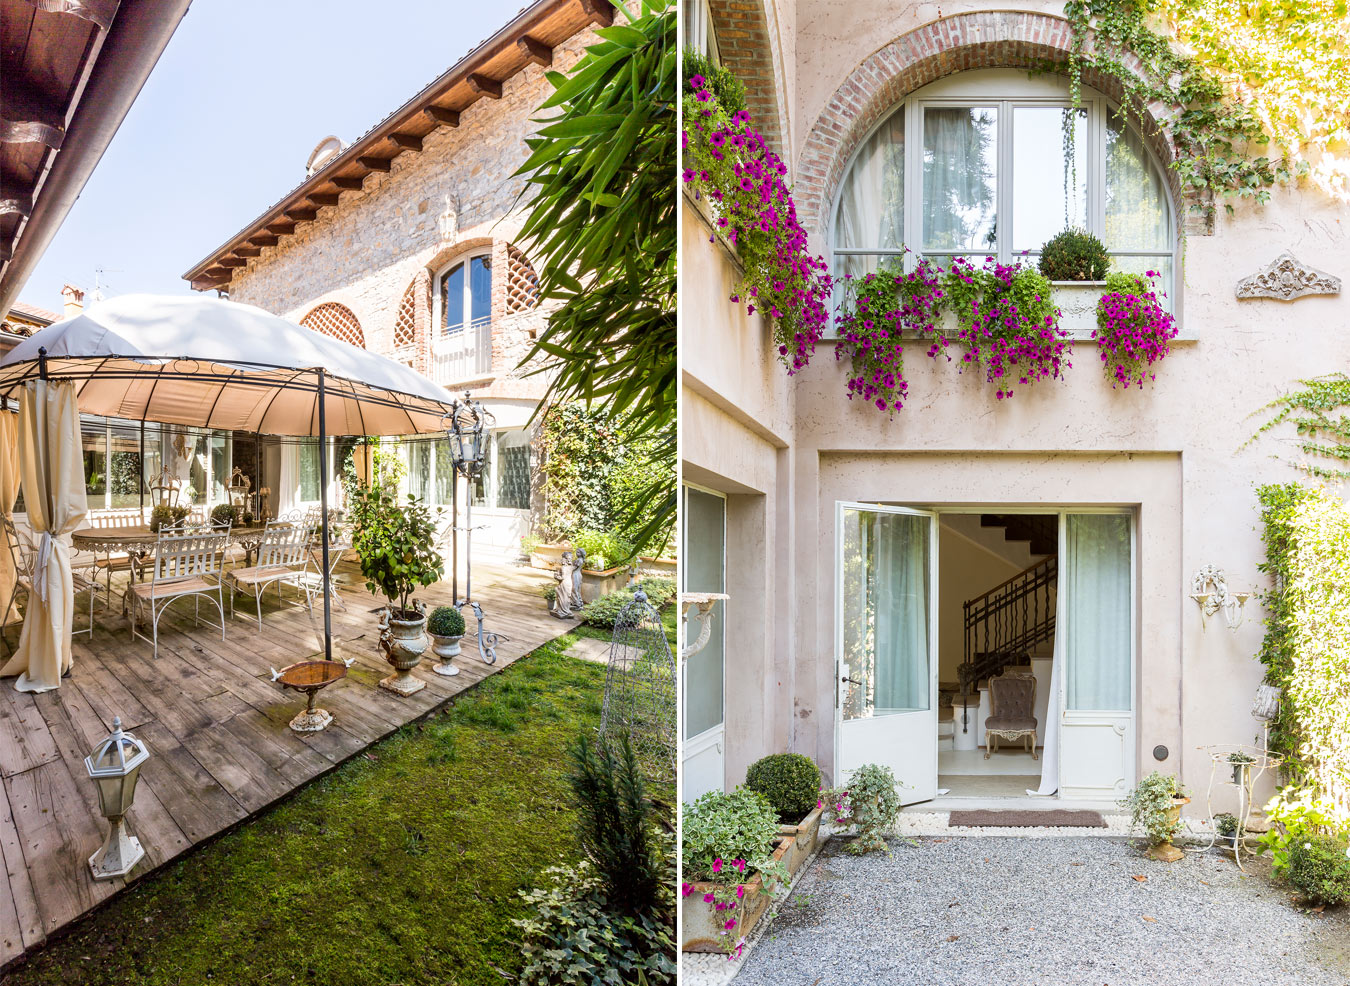 Casa shabby chic arredamento in stile shabby westwing for Arredamento casa dalani